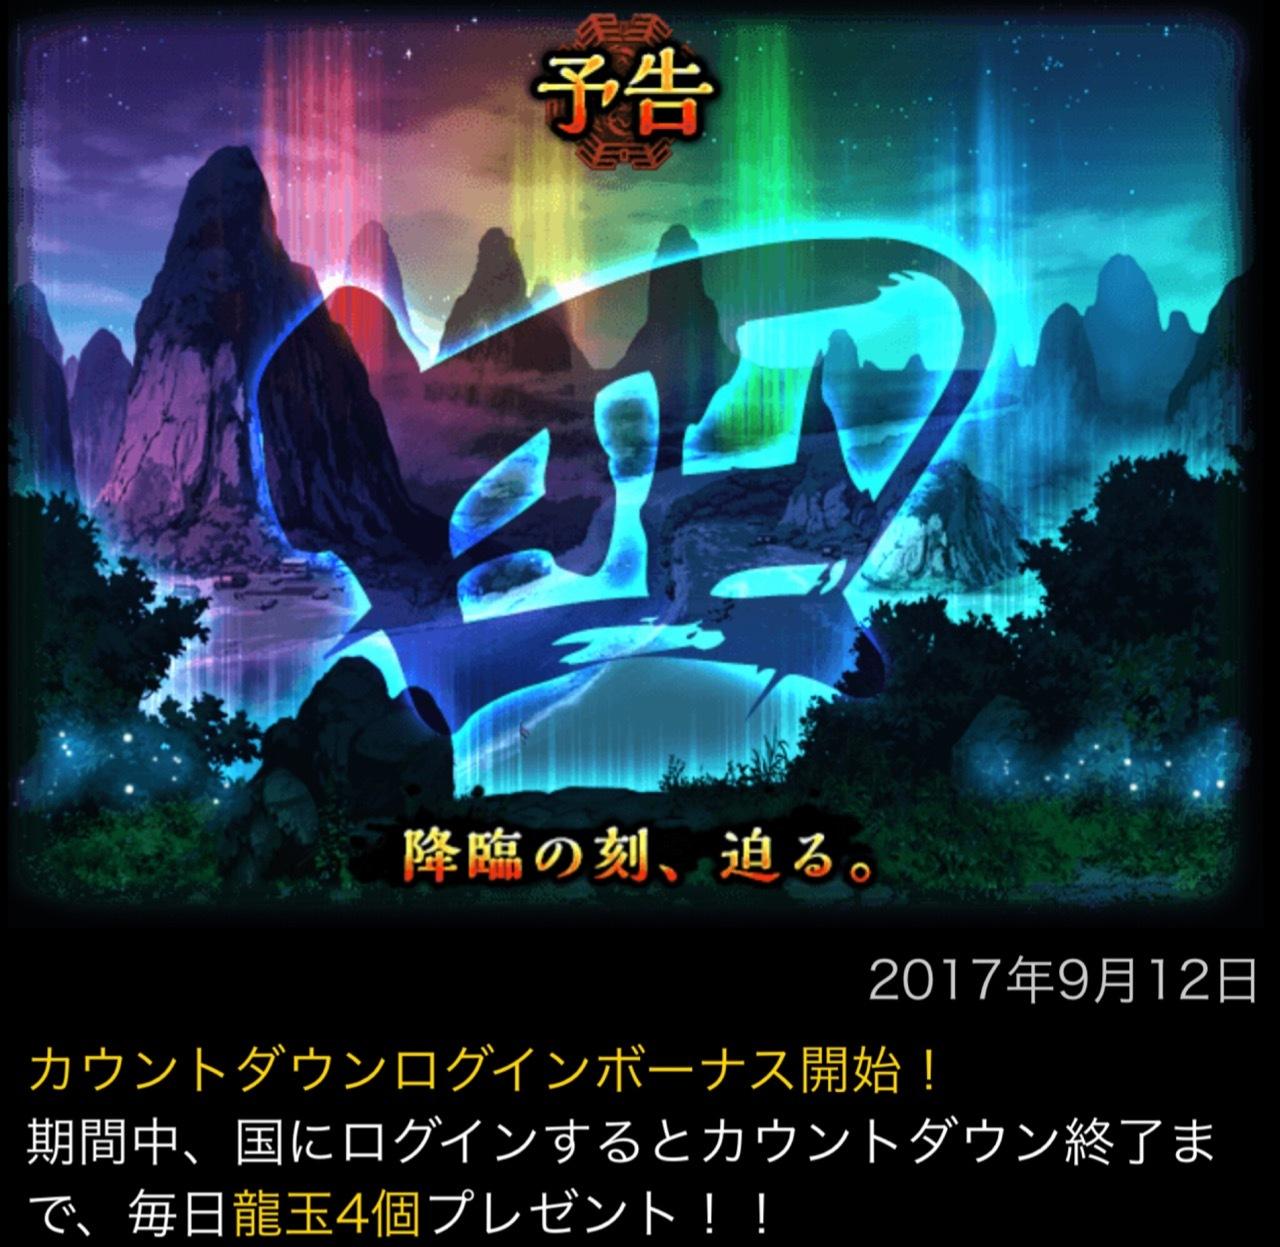 201709132102574c7.jpg